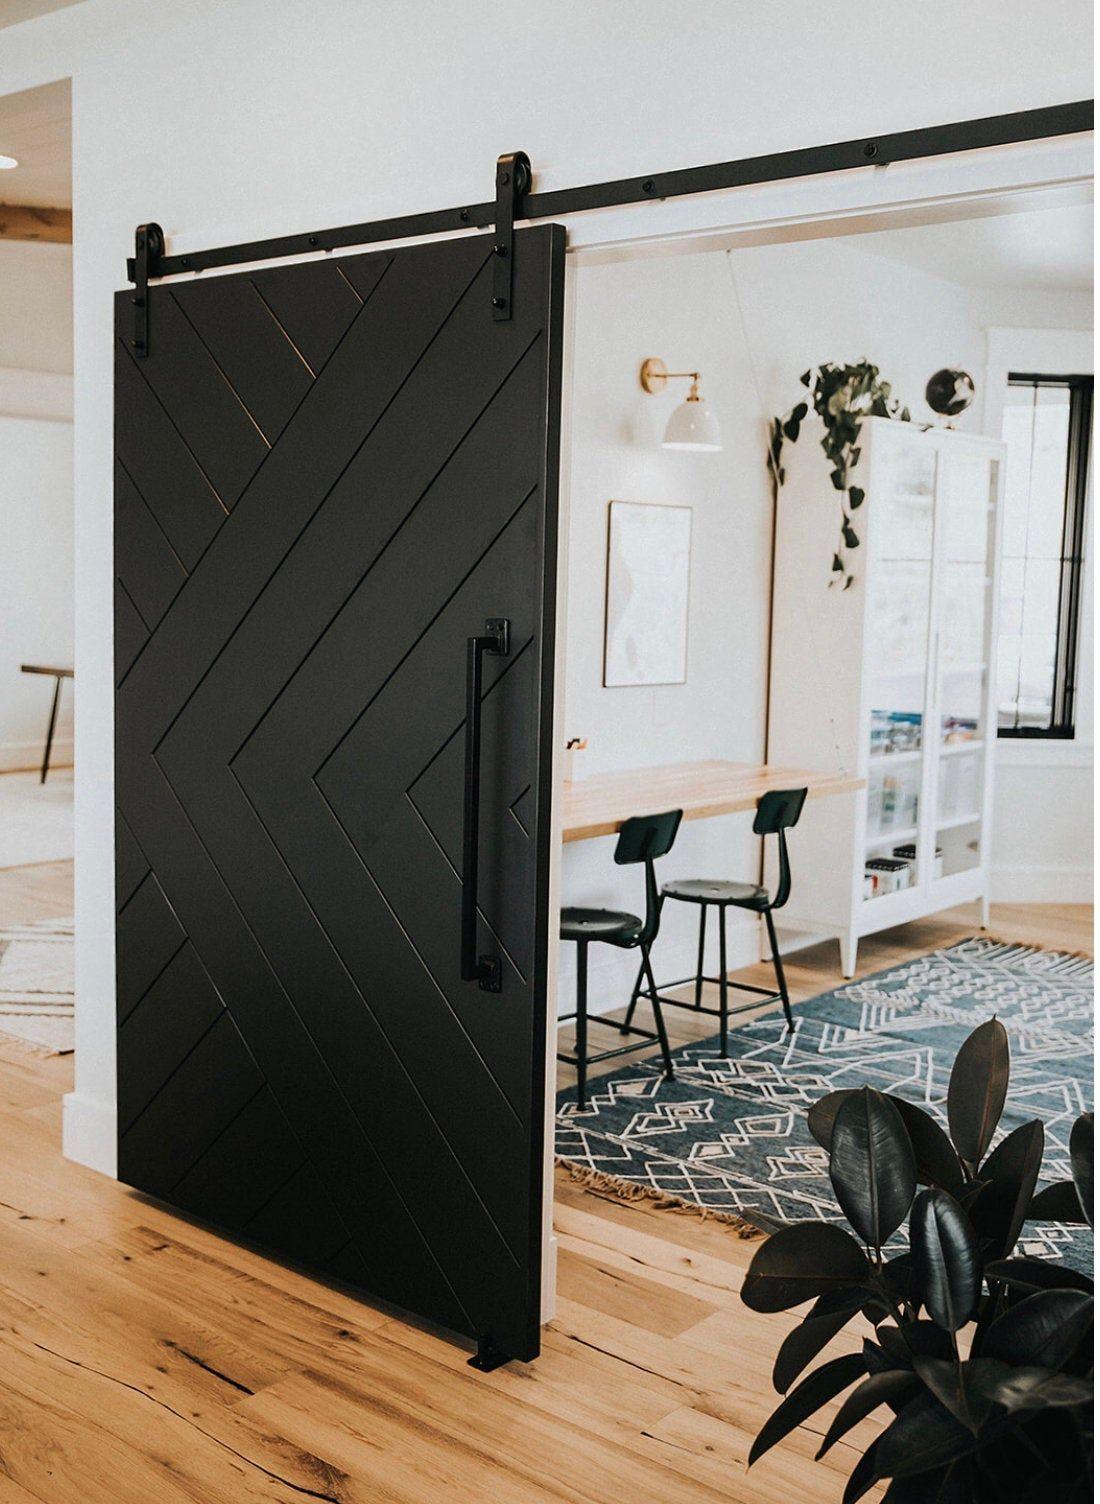 Custom Built Sliding Barn Door Hinge Pocket Door X Design Etsy In 2020 Sliding Door Design Modern Sliding Doors Interior Barn Doors